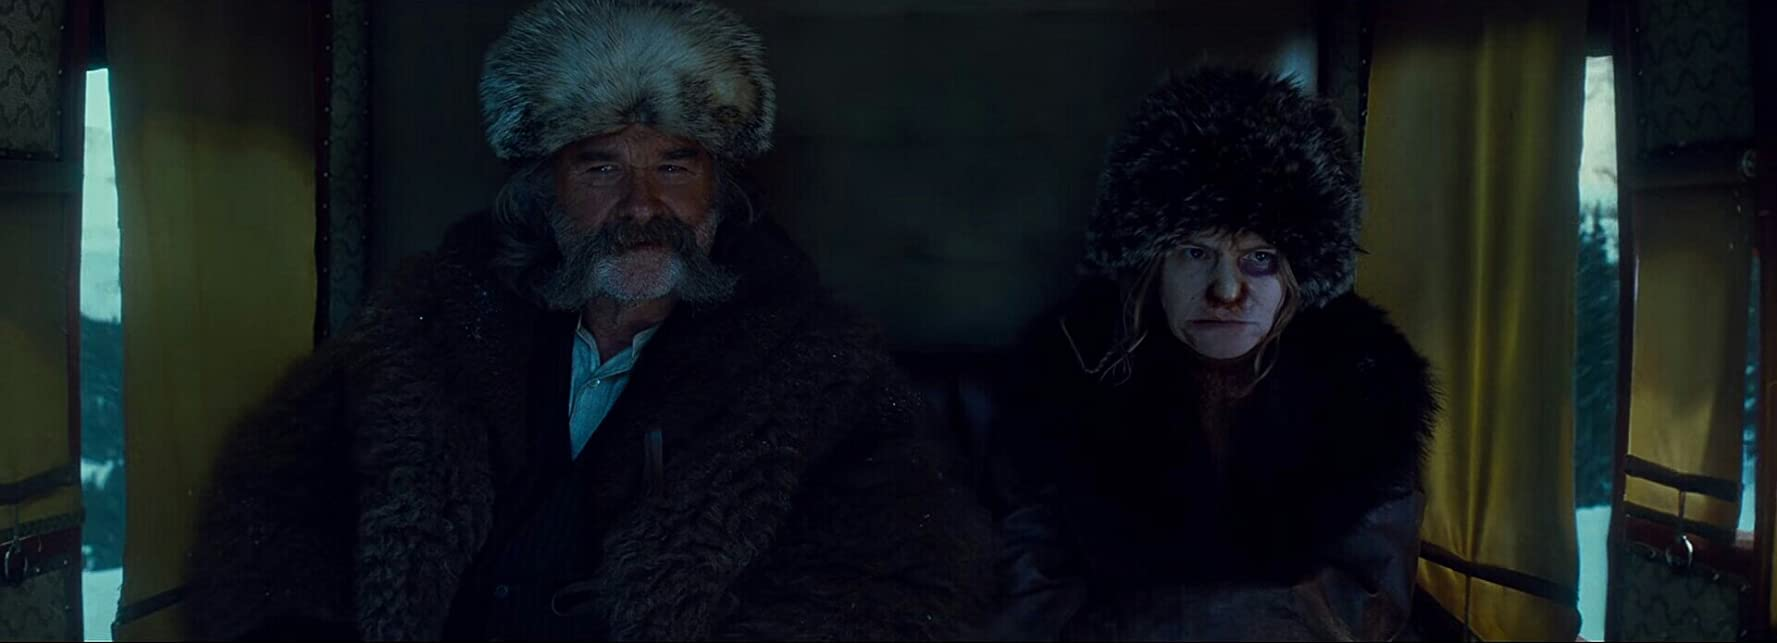 Jennifer Jason Leigh and Kurt Russell in The Hateful Eight (2015)